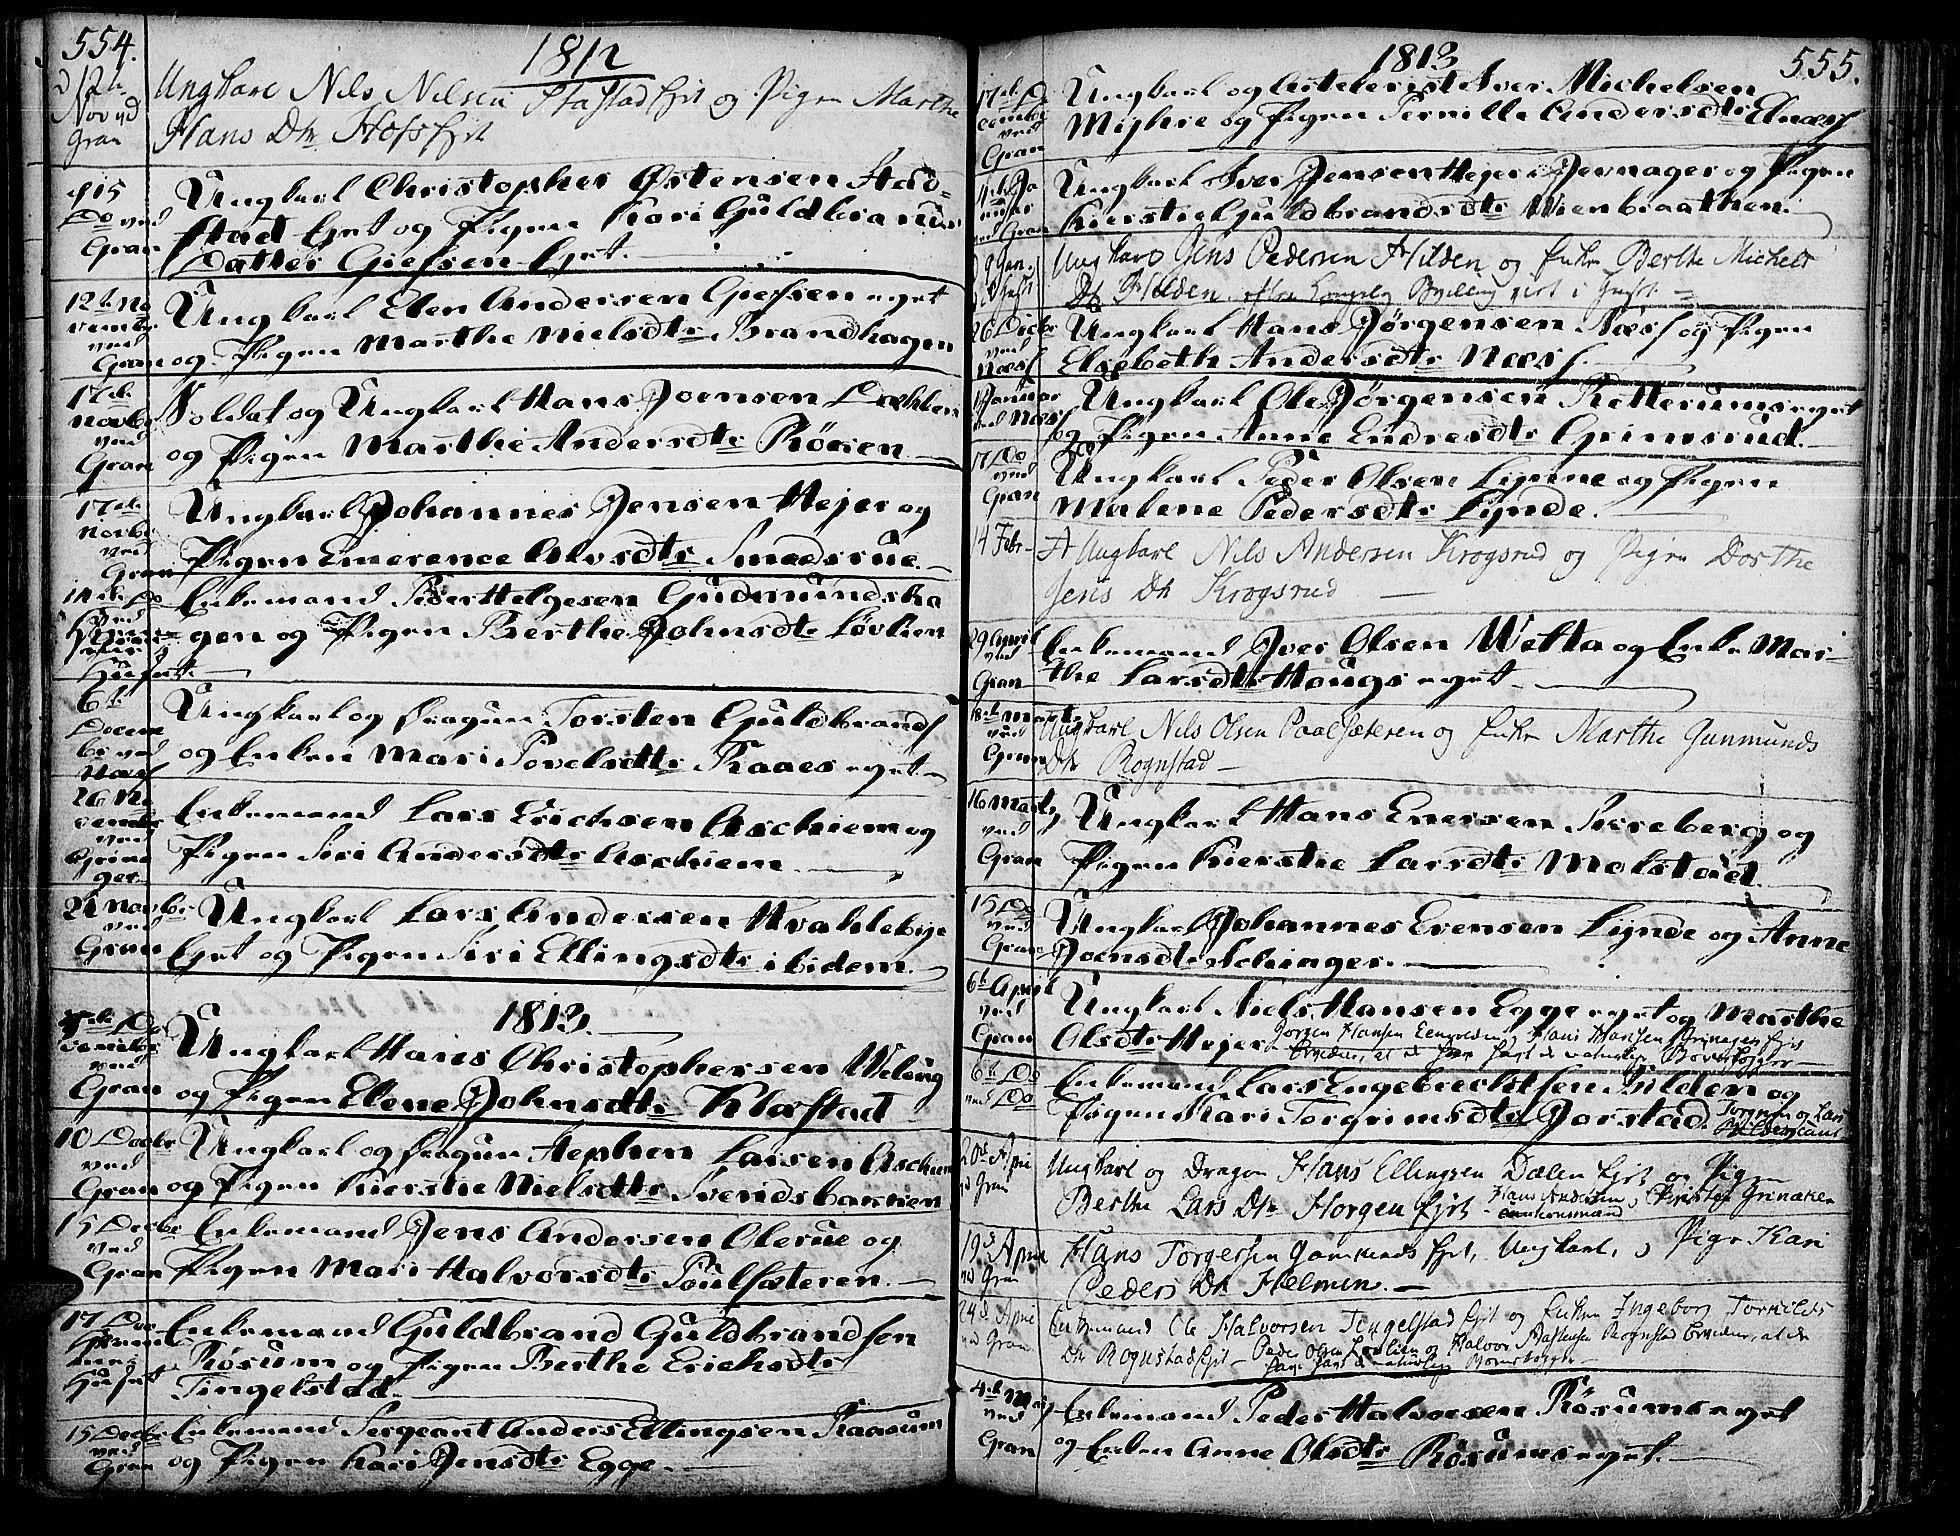 SAH, Gran prestekontor, Ministerialbok nr. 6, 1787-1824, s. 554-555